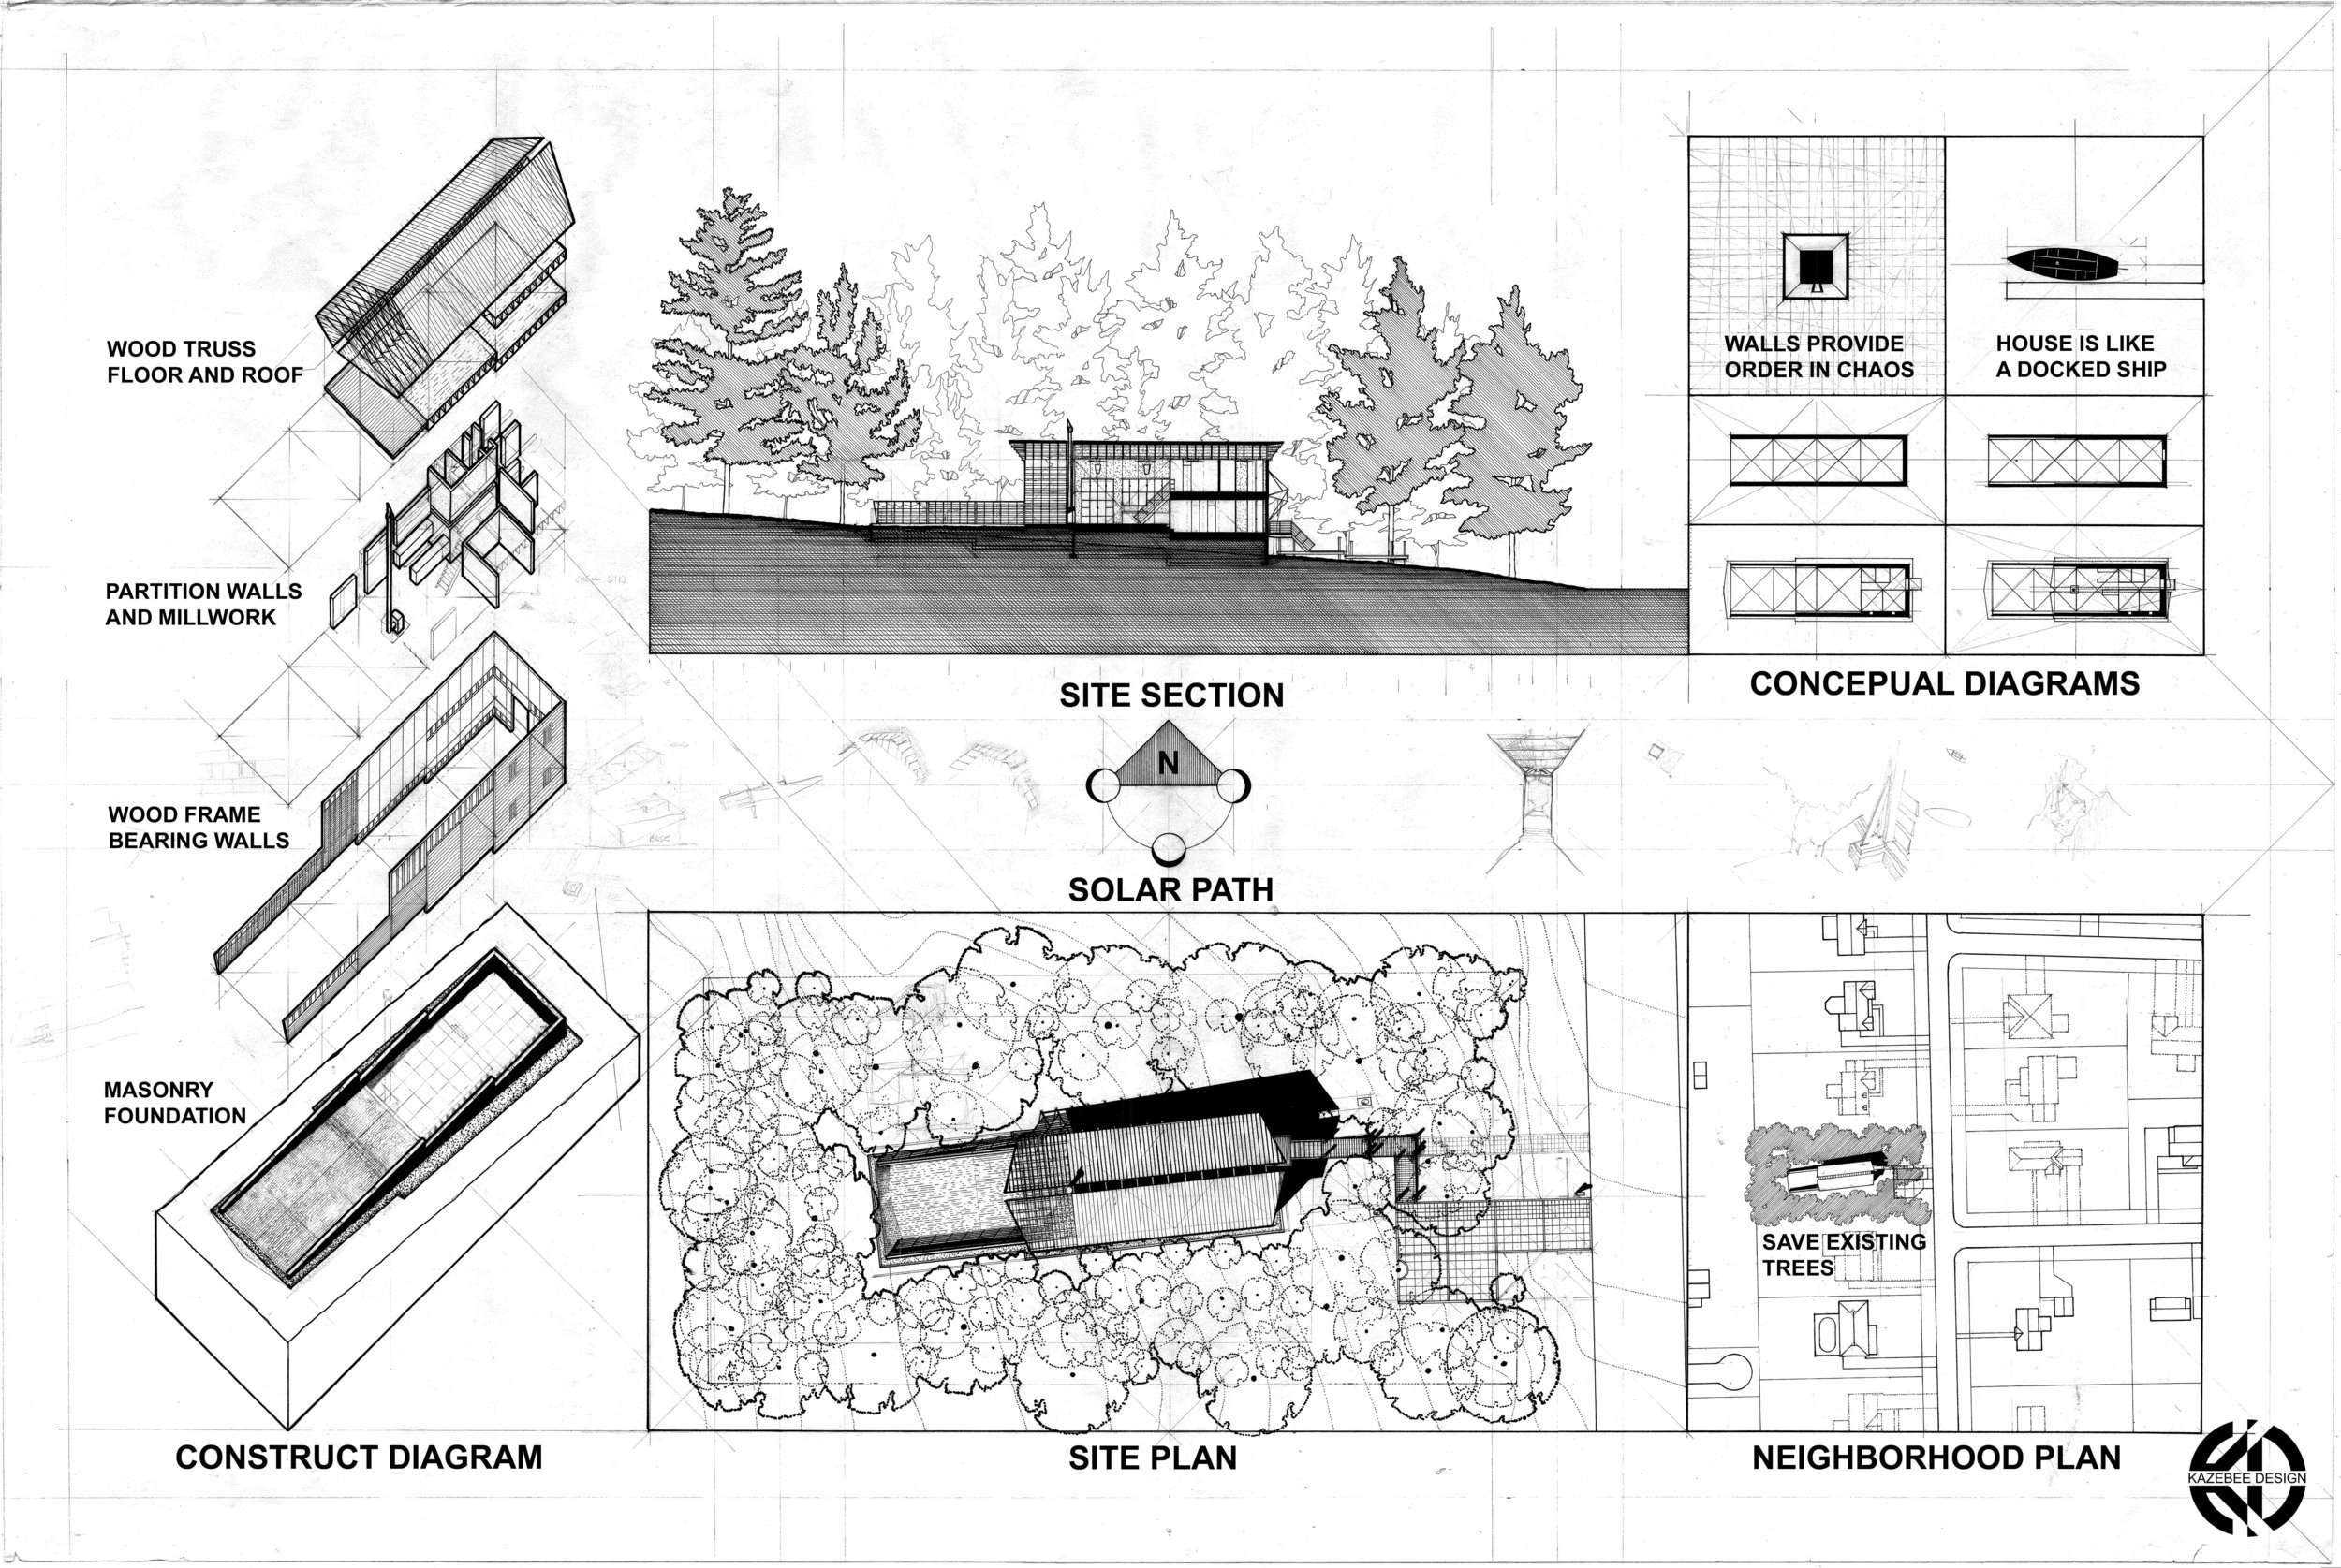 Kazebee House concept draft image